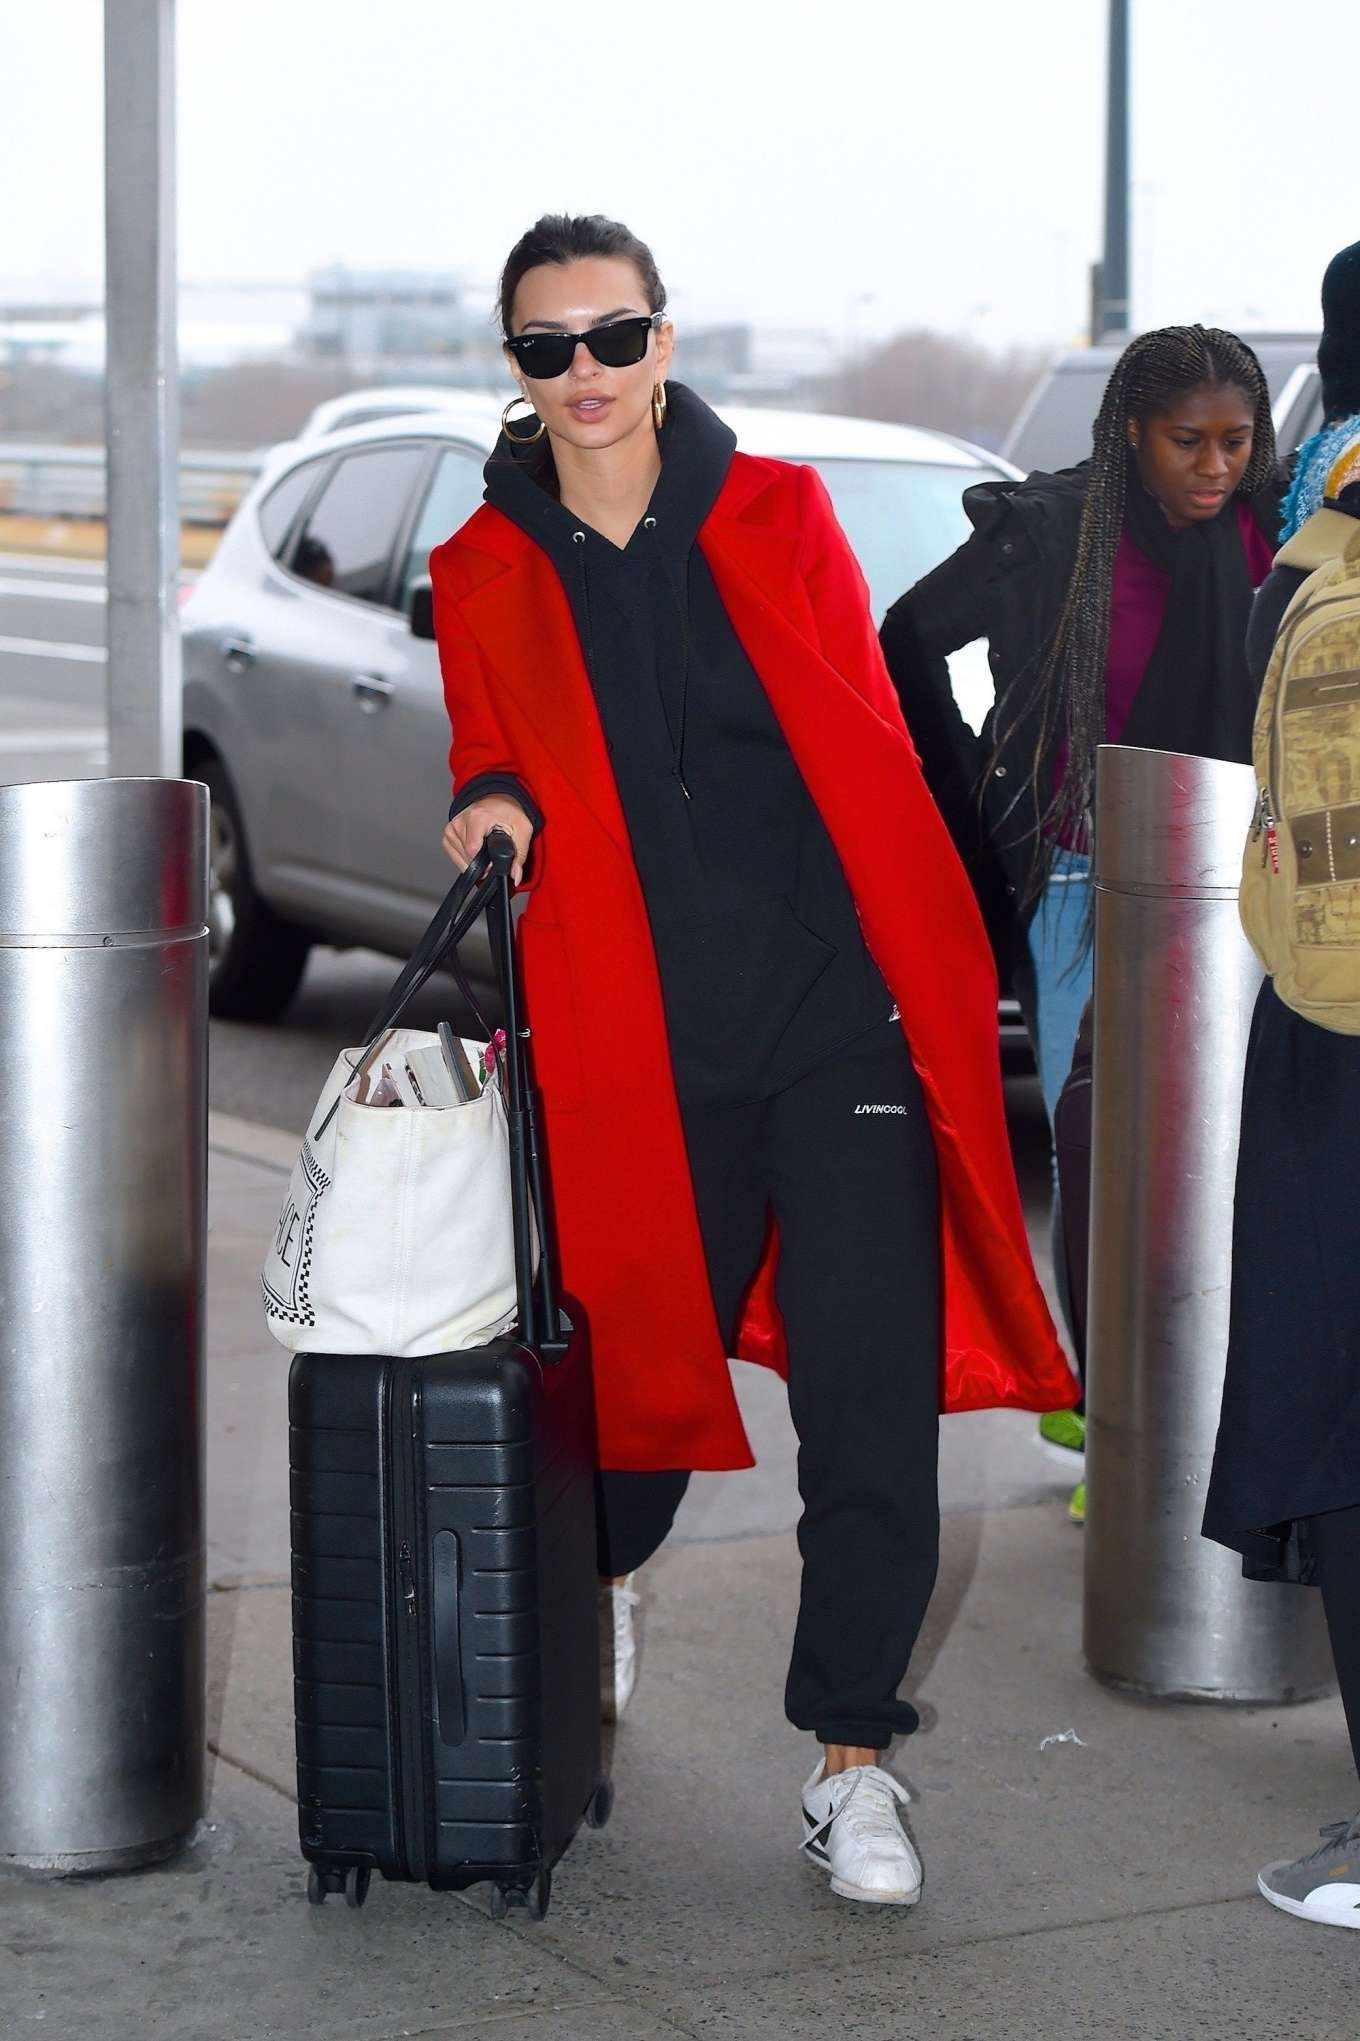 Emily Ratajkowski 2020 : Emily Ratajkowski in red coat ready for flight at JFK airport-17